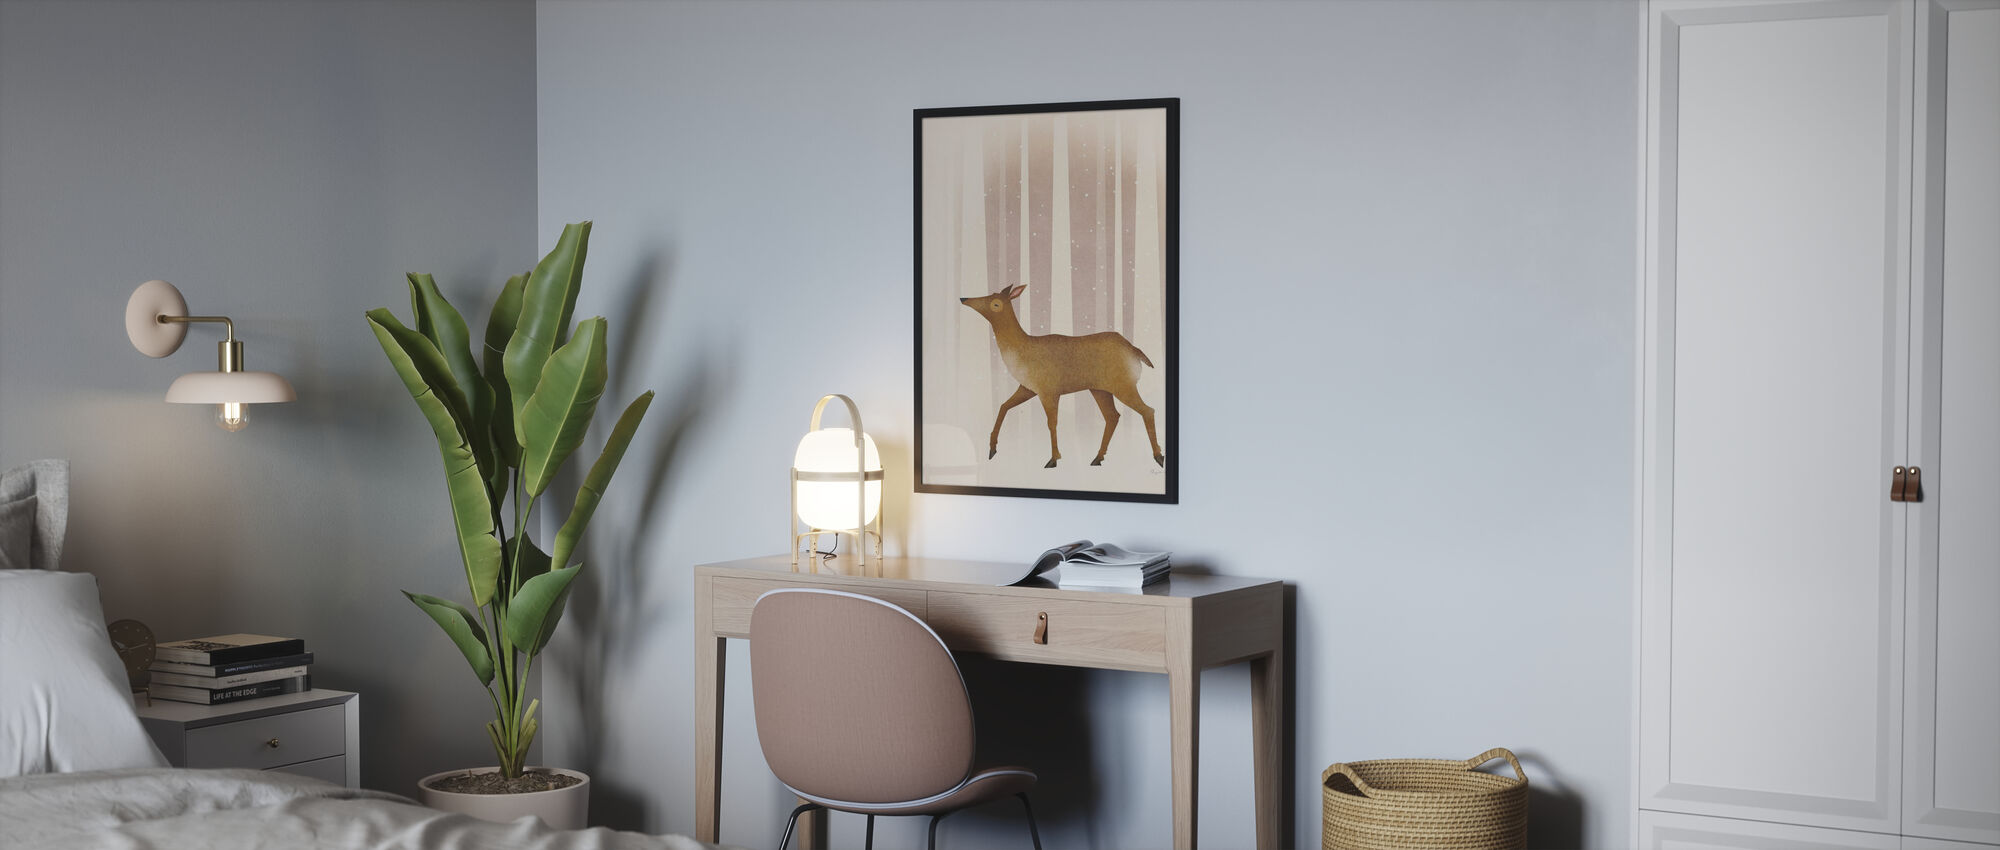 Snowy Doe - Poster - Bedroom